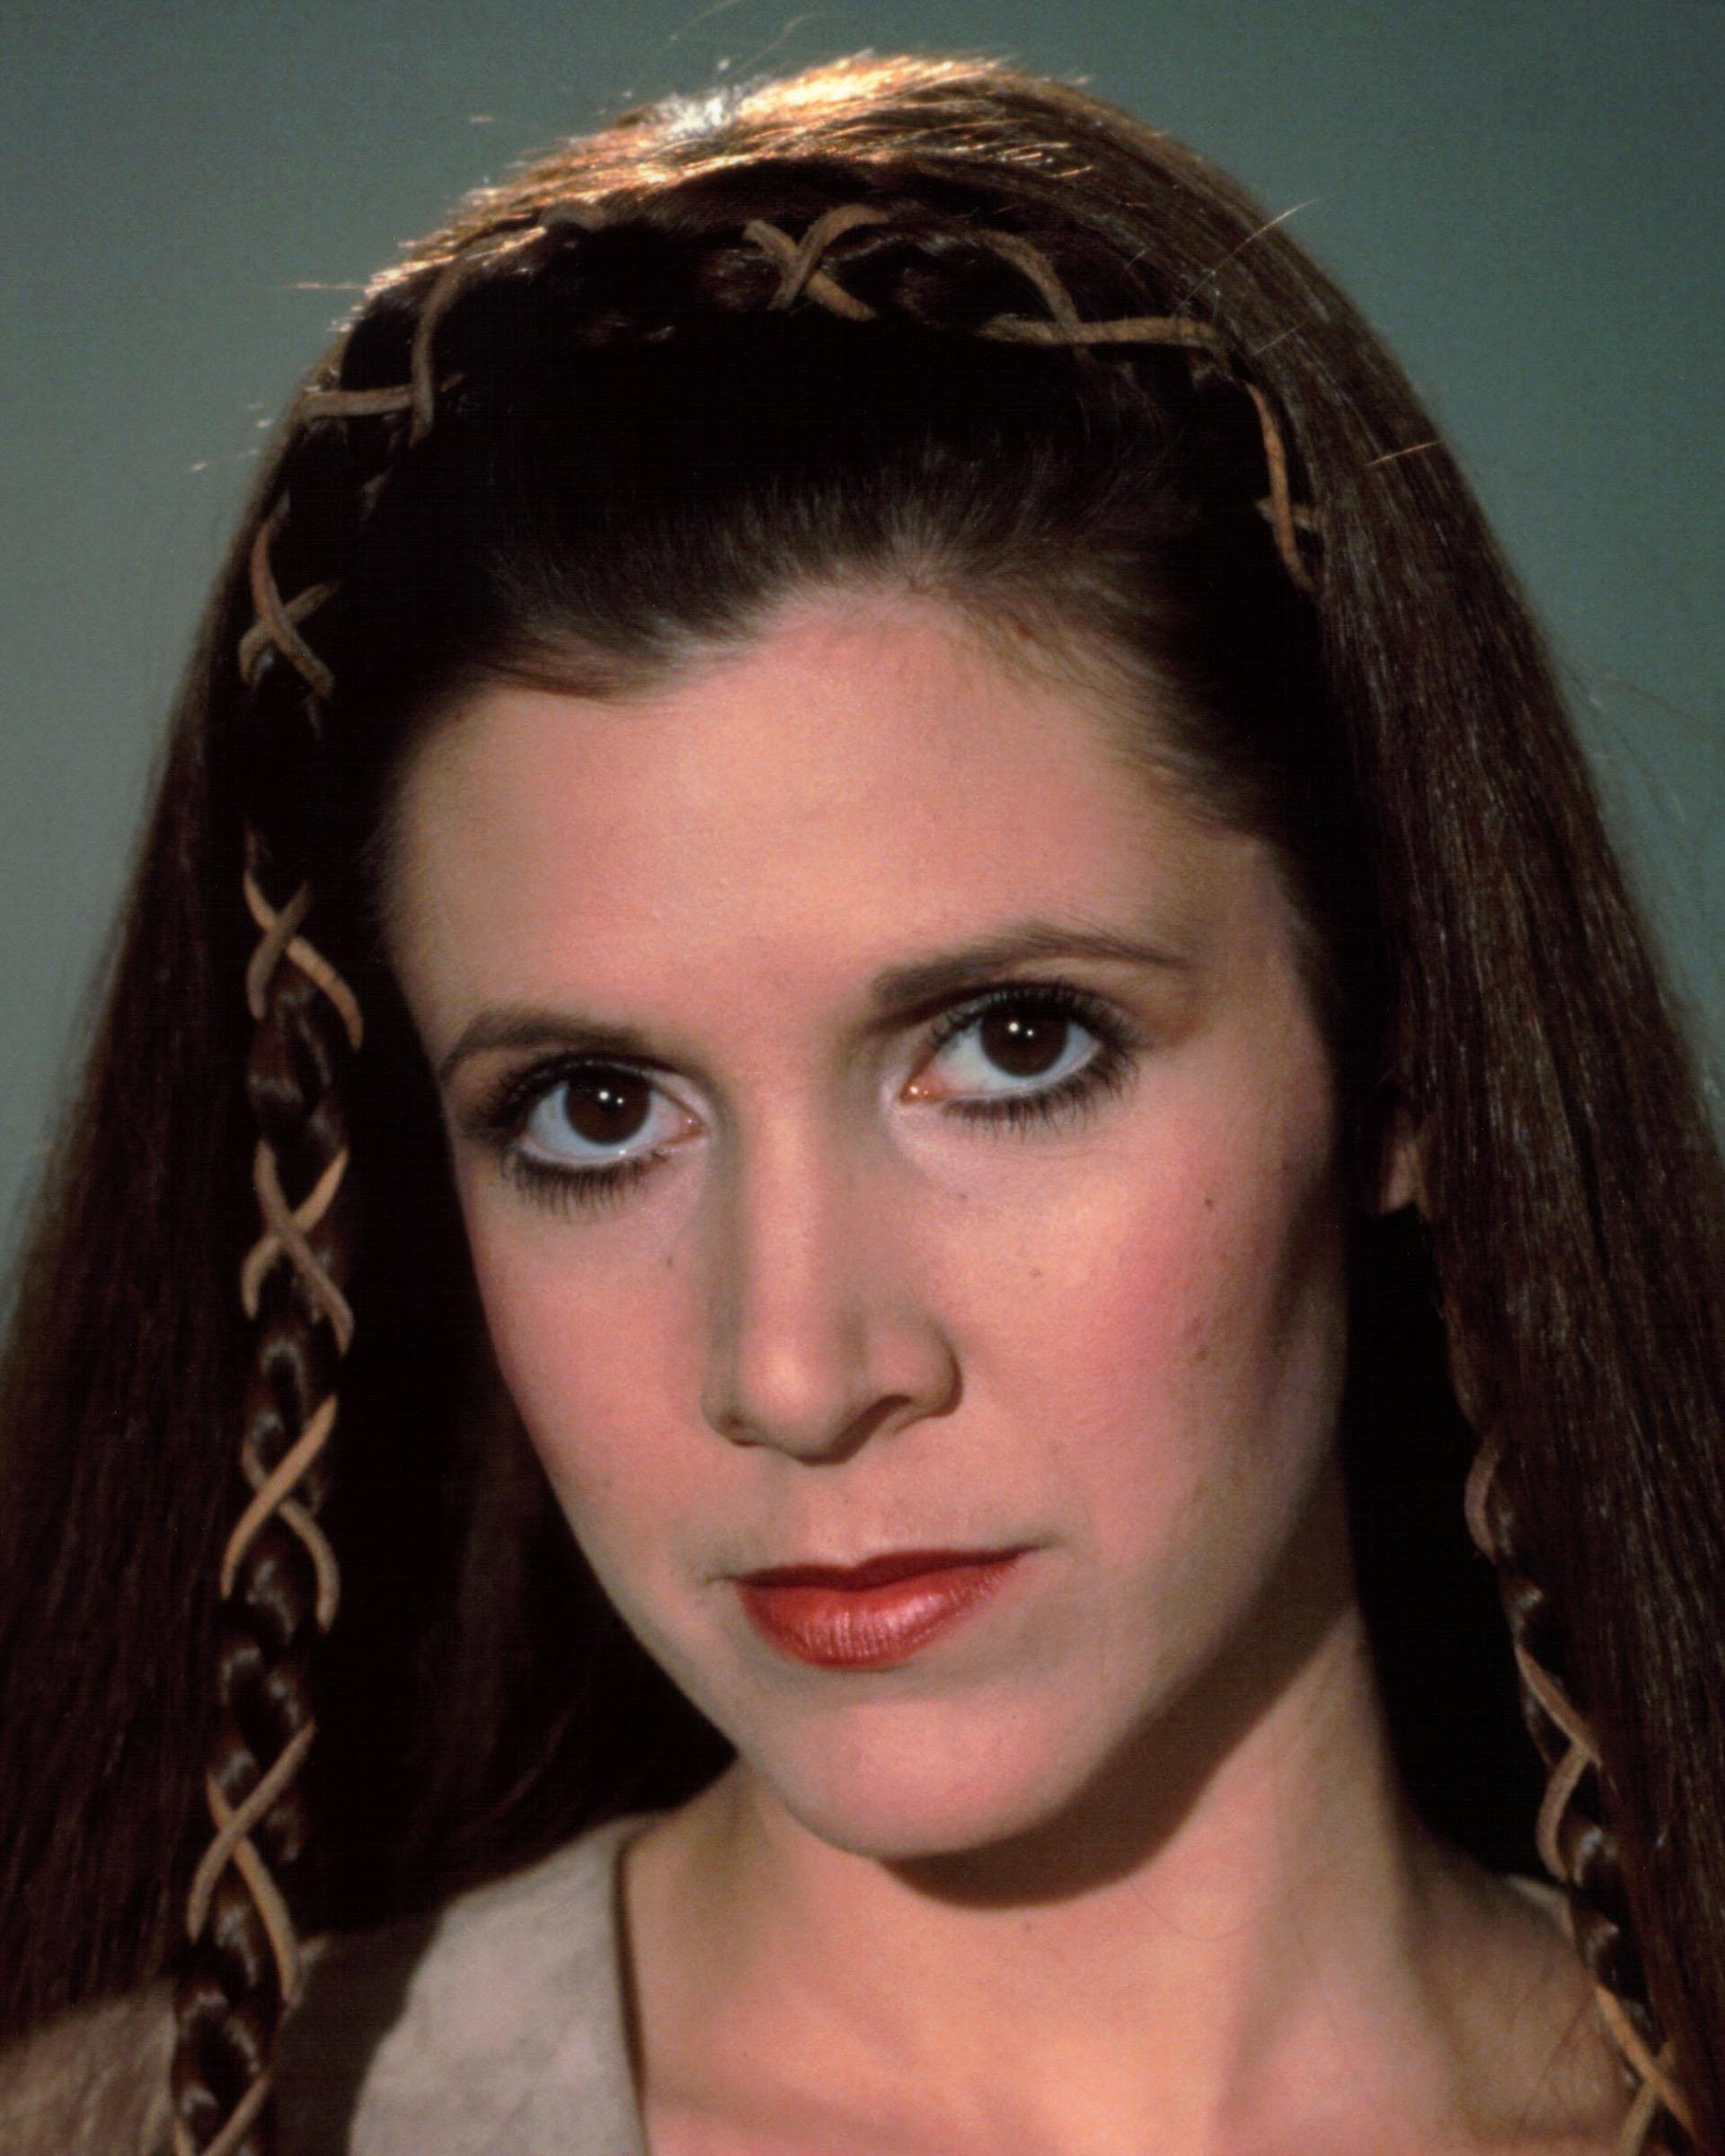 Leia Organa Solo Wookieepedia Fandom Powered By Wikia